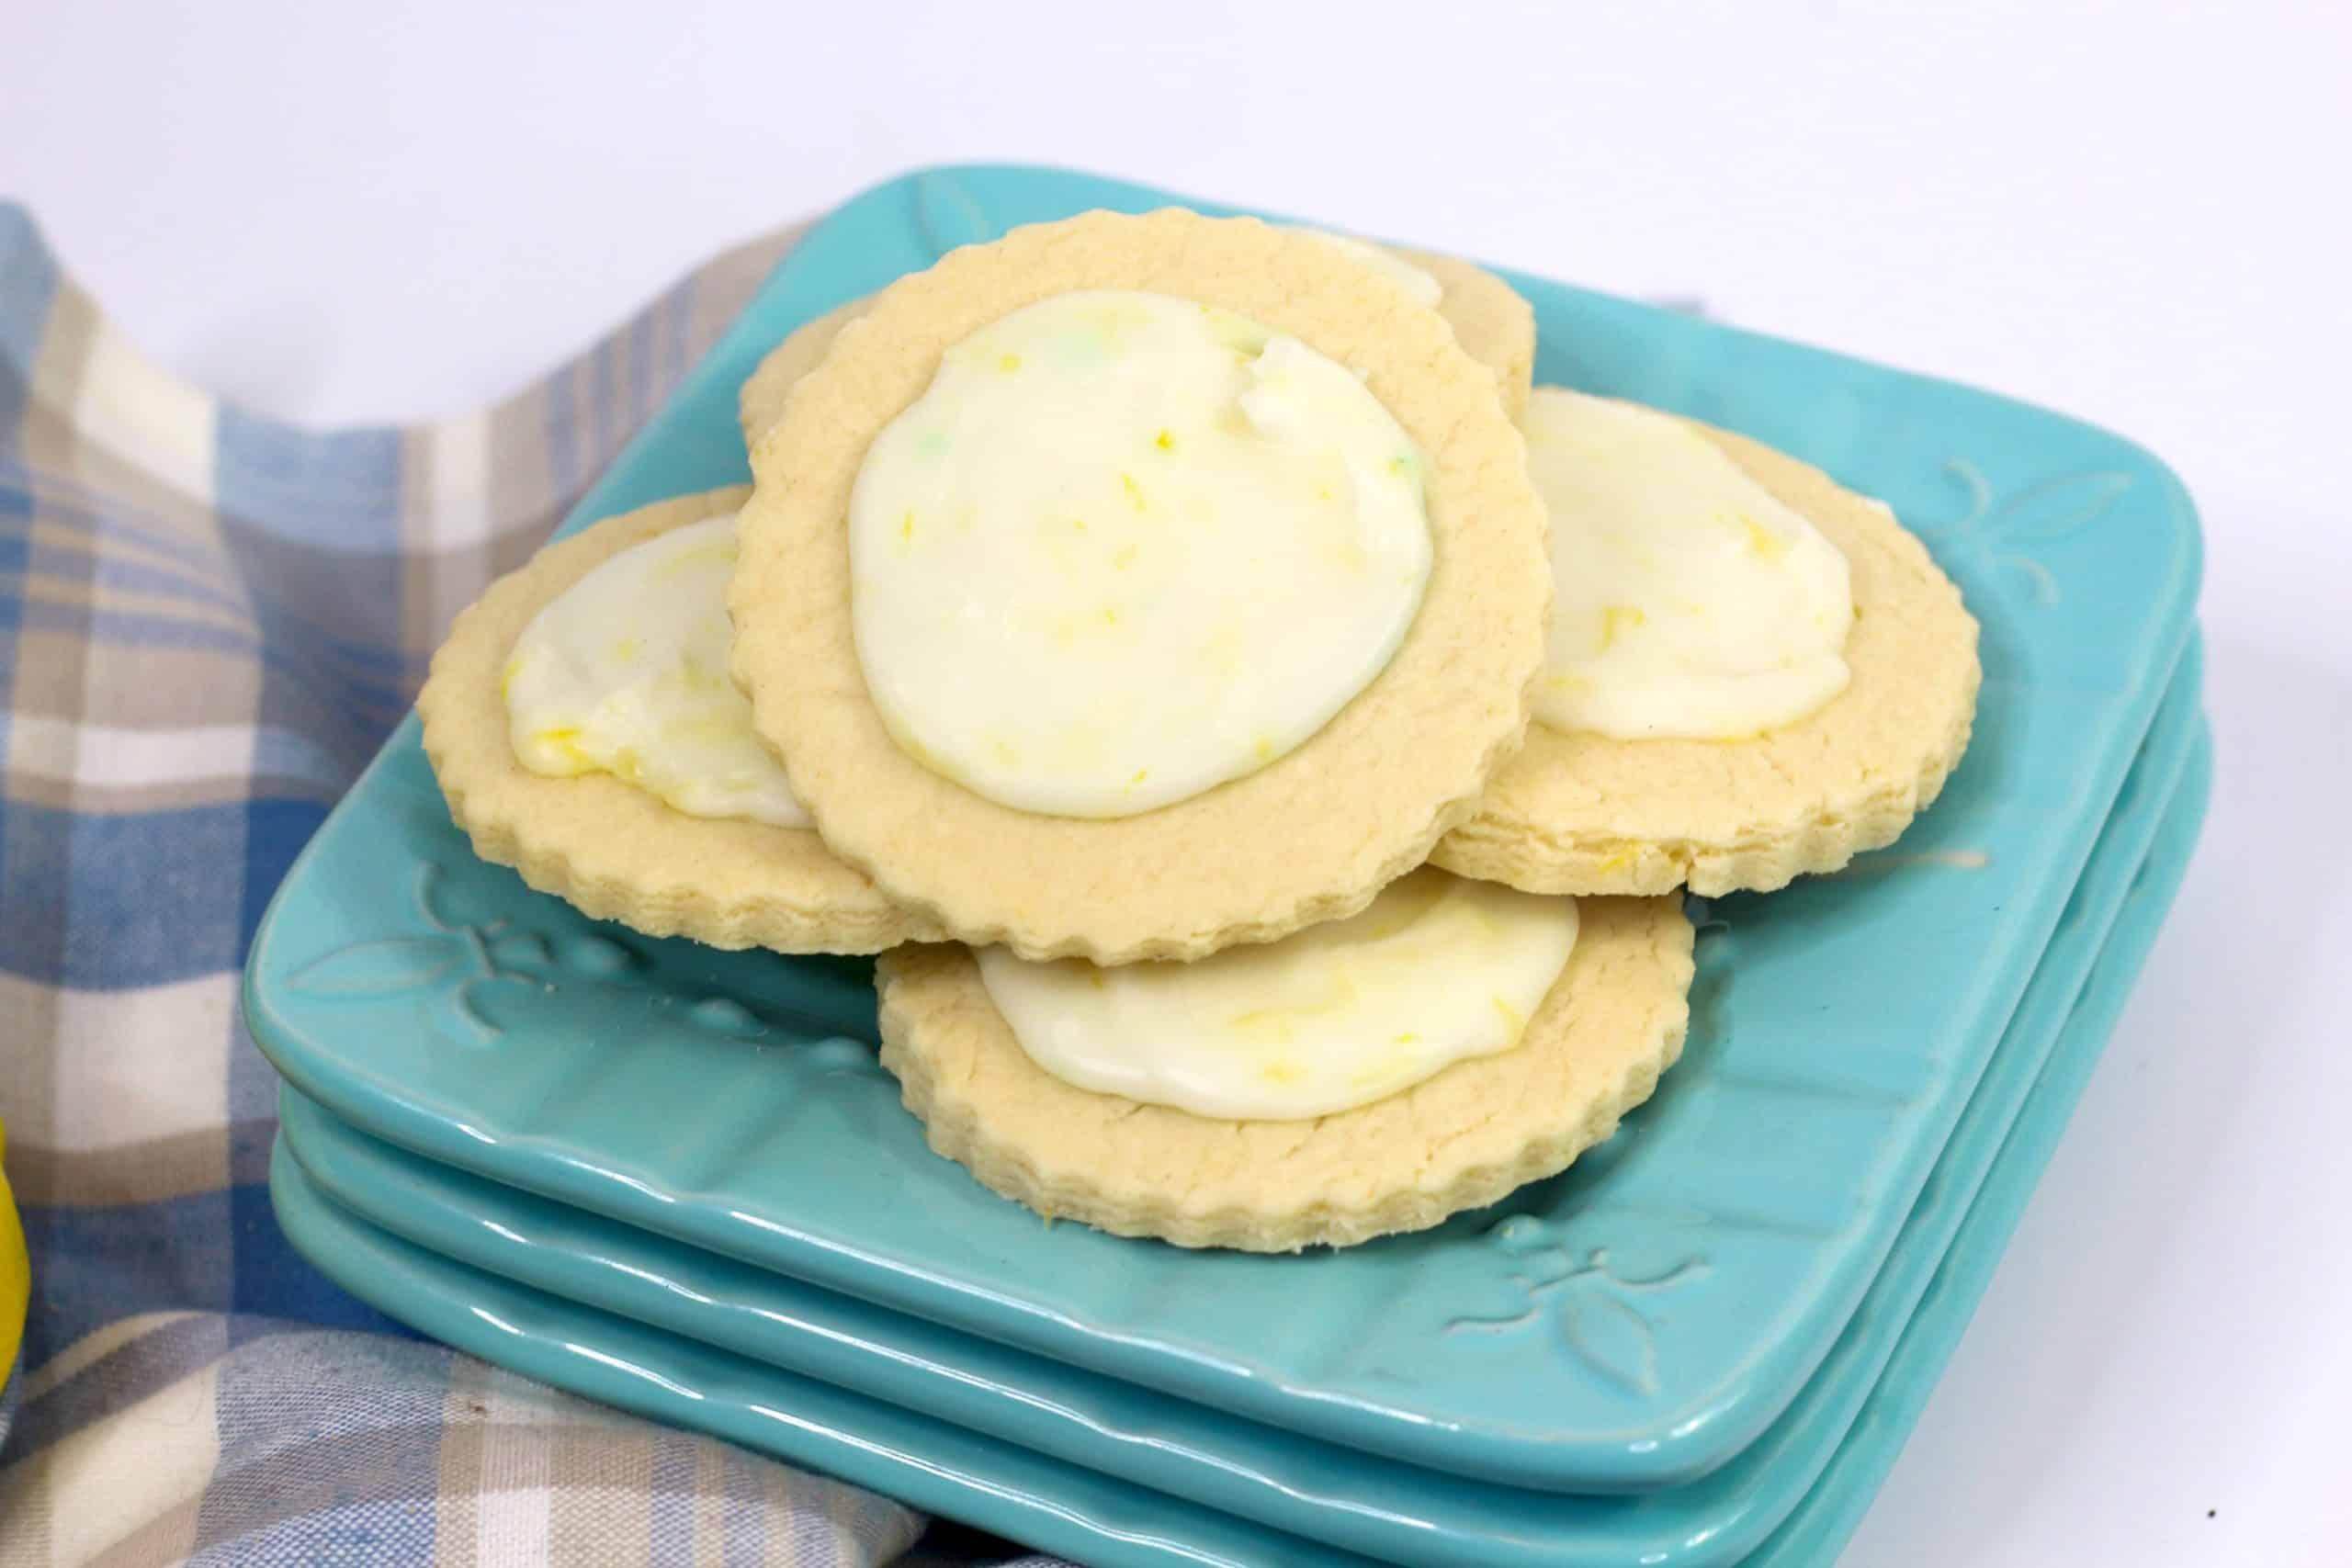 Meyer Lemon sugar cookies on a blue plate